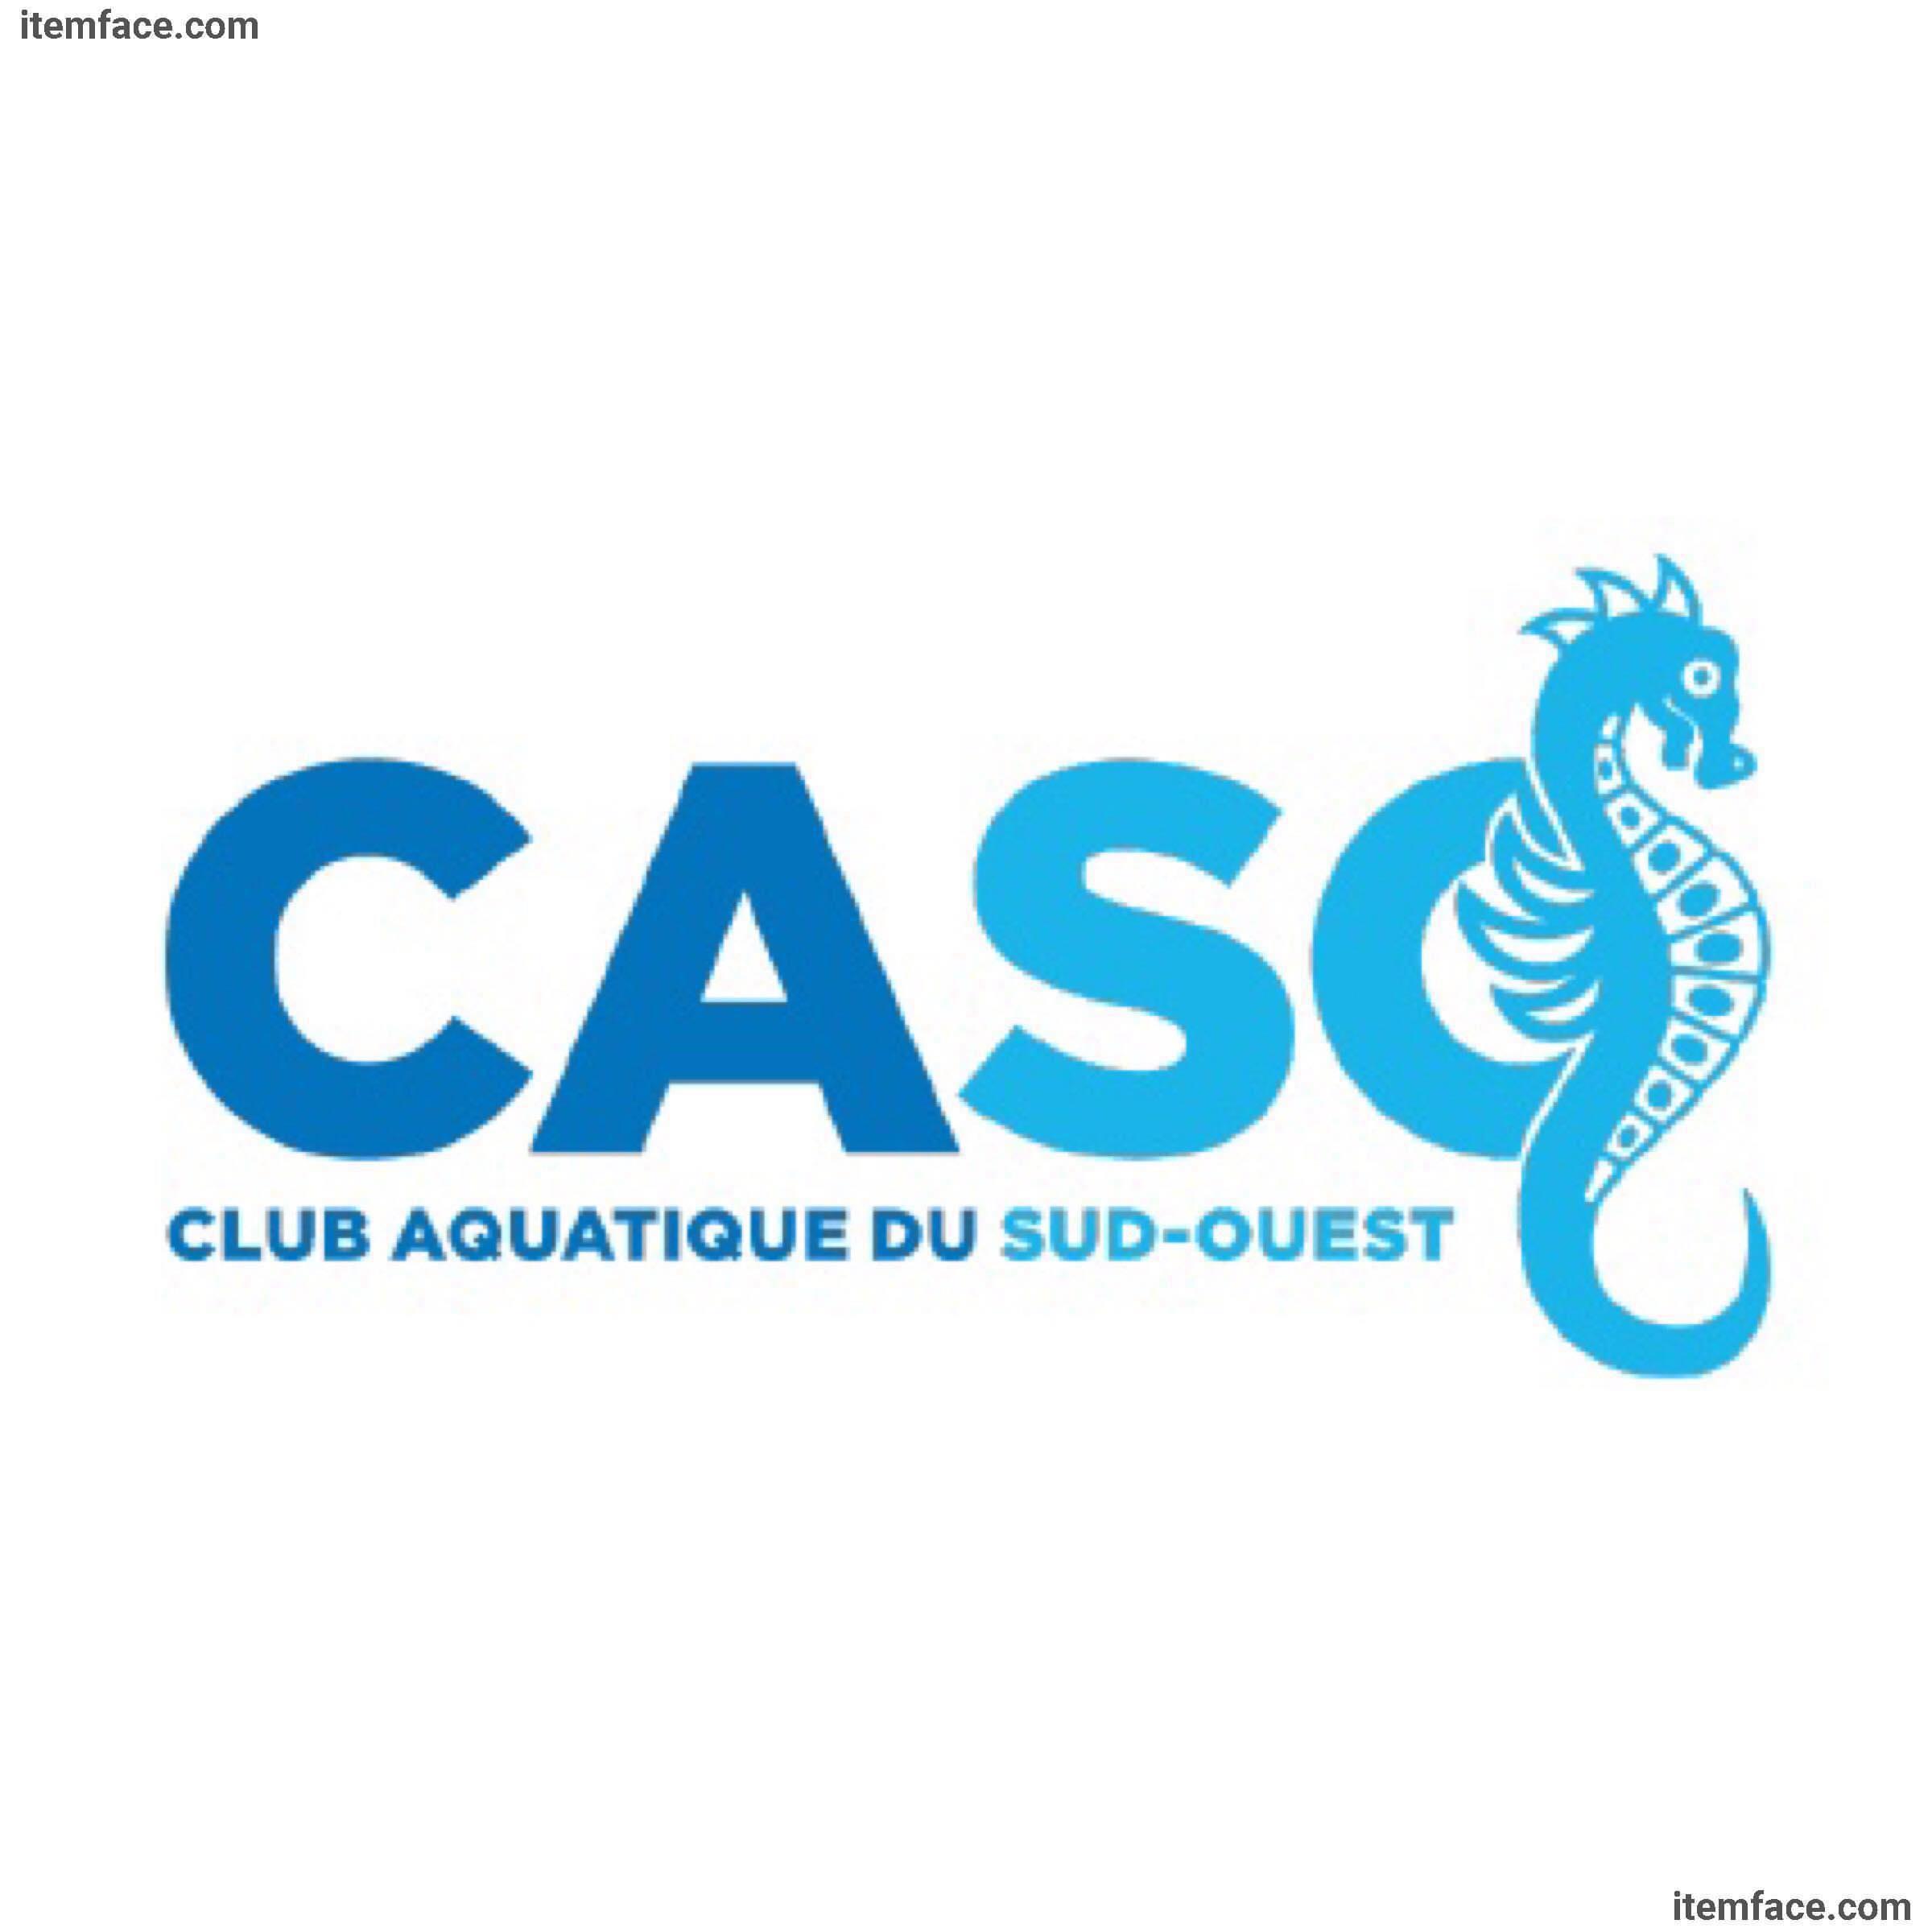 Club Aquatique Du Sud-Ouest (CASO) - Sports Club